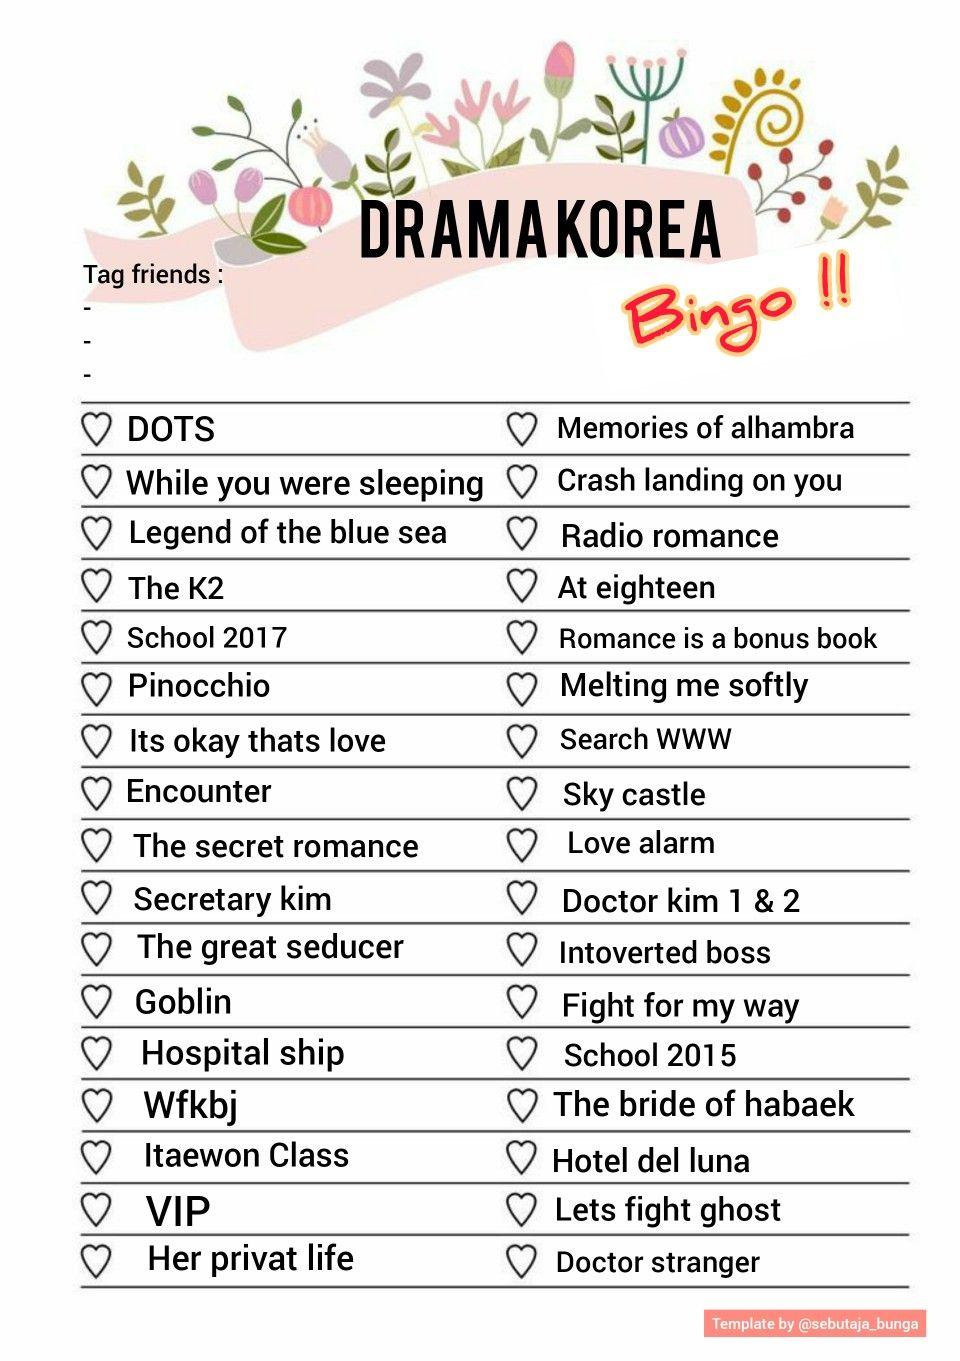 Drama Korea Bingo Korean Drama List Korean Drama Tv Korean Drama